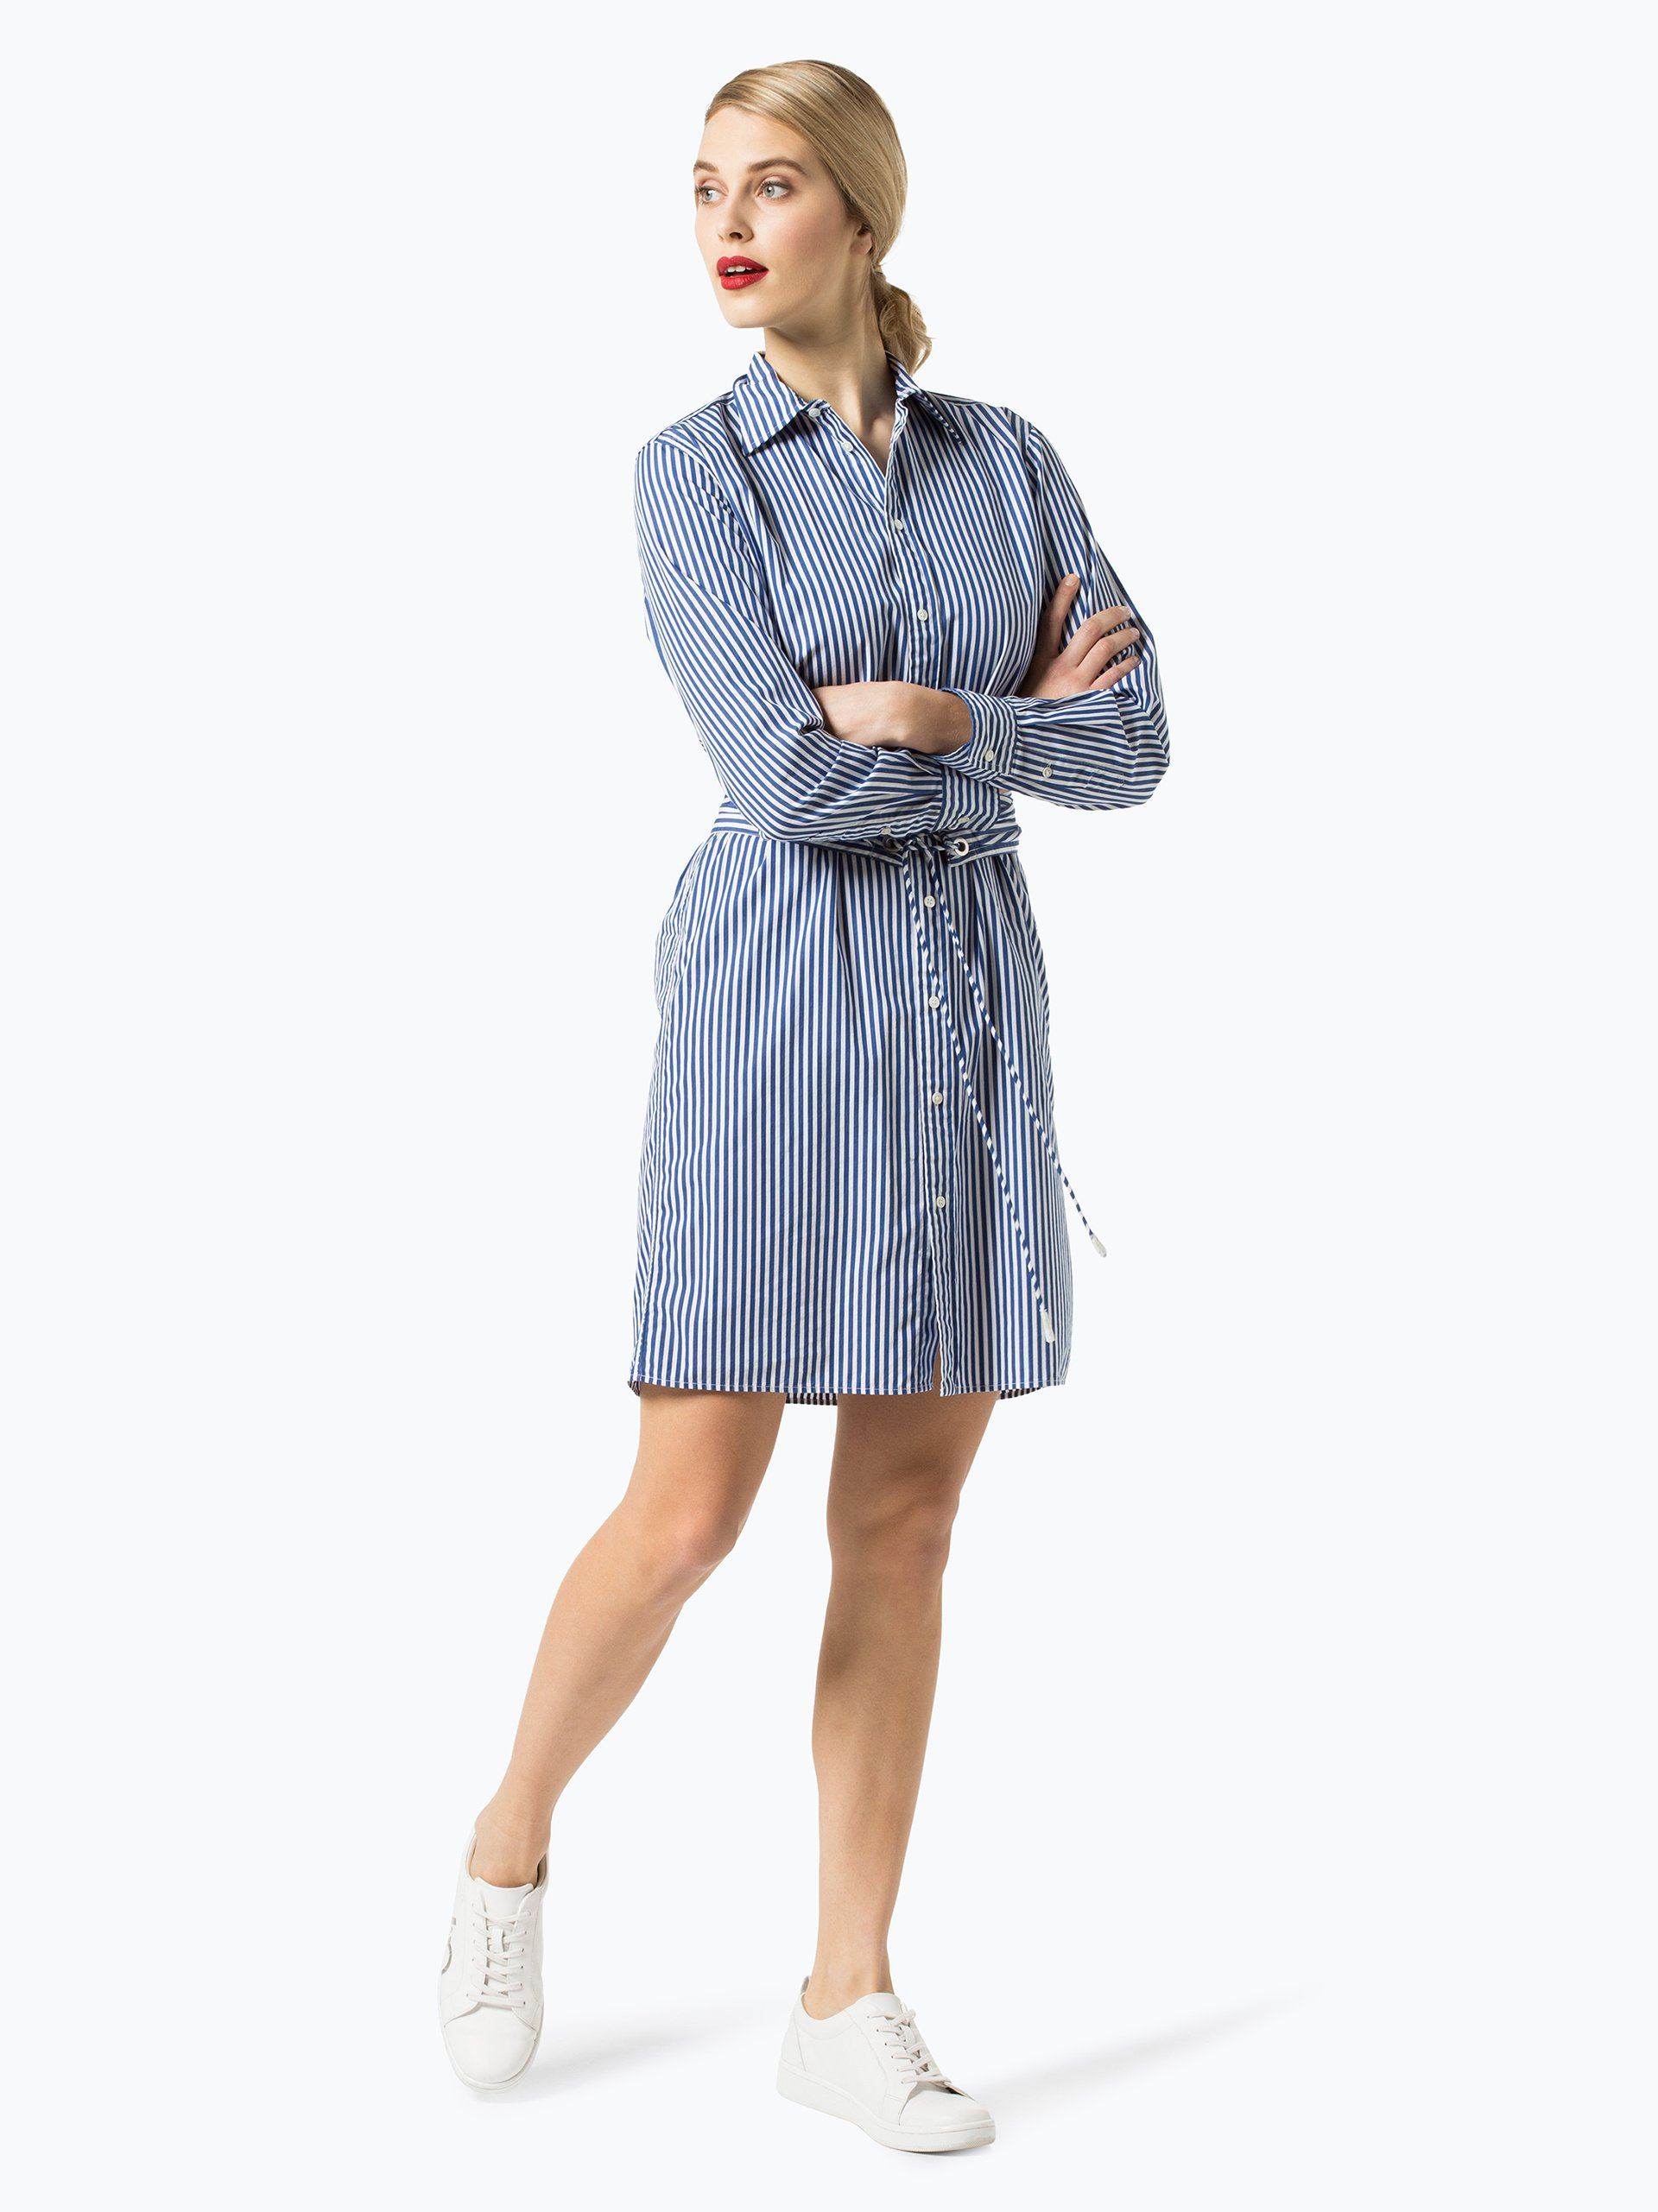 polo ralph lauren damen kleid indigo gestreift online. Black Bedroom Furniture Sets. Home Design Ideas